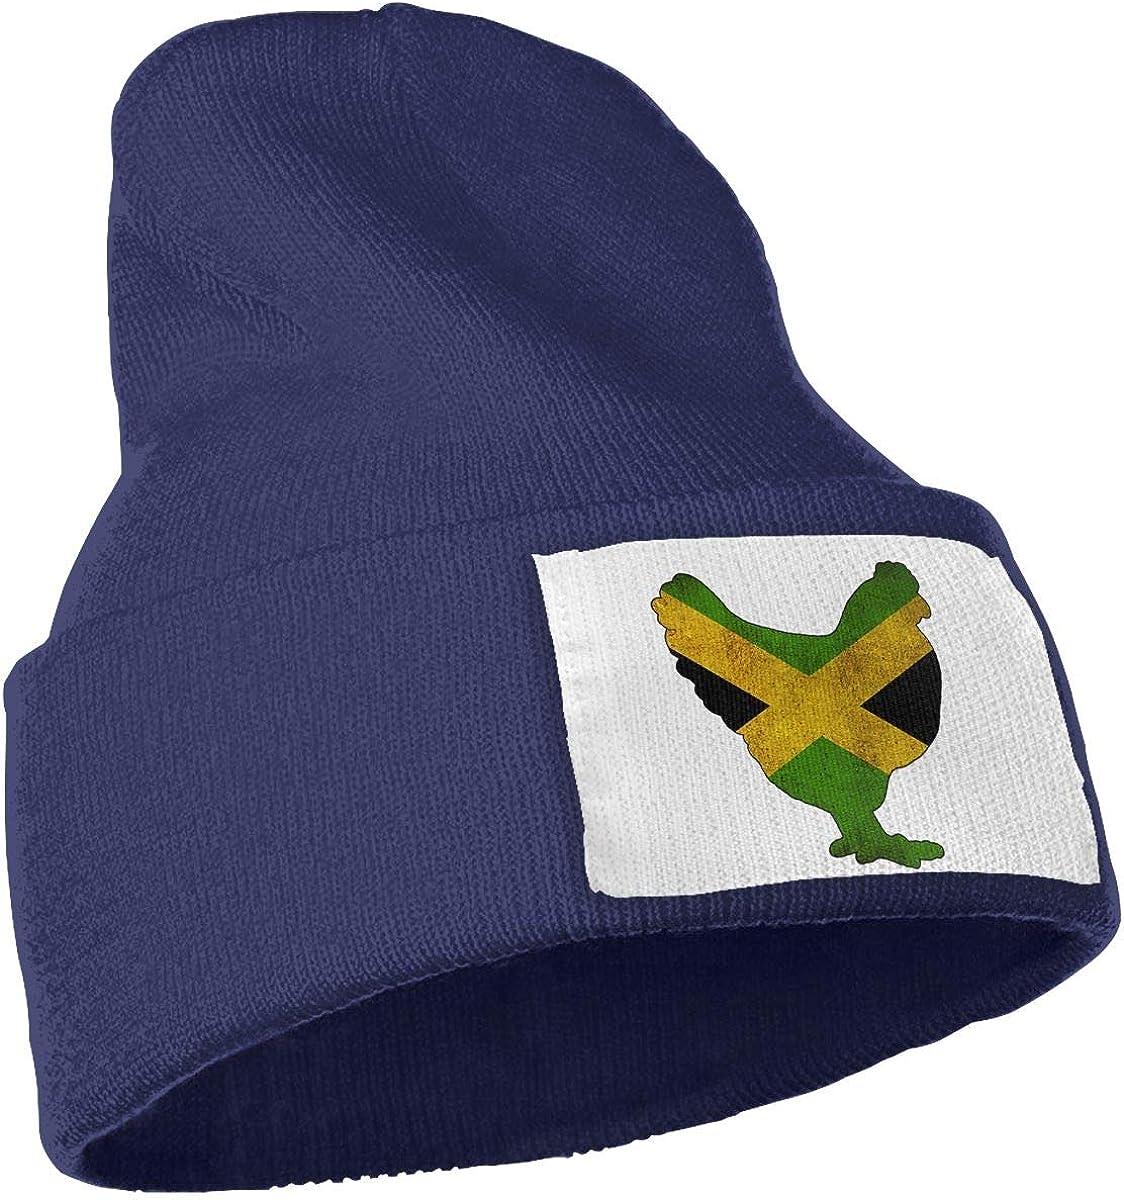 TAOMAP89 Jamaica Flag Chicken Men /& Women Skull Caps Winter Warm Stretchy Knit Beanie Hats